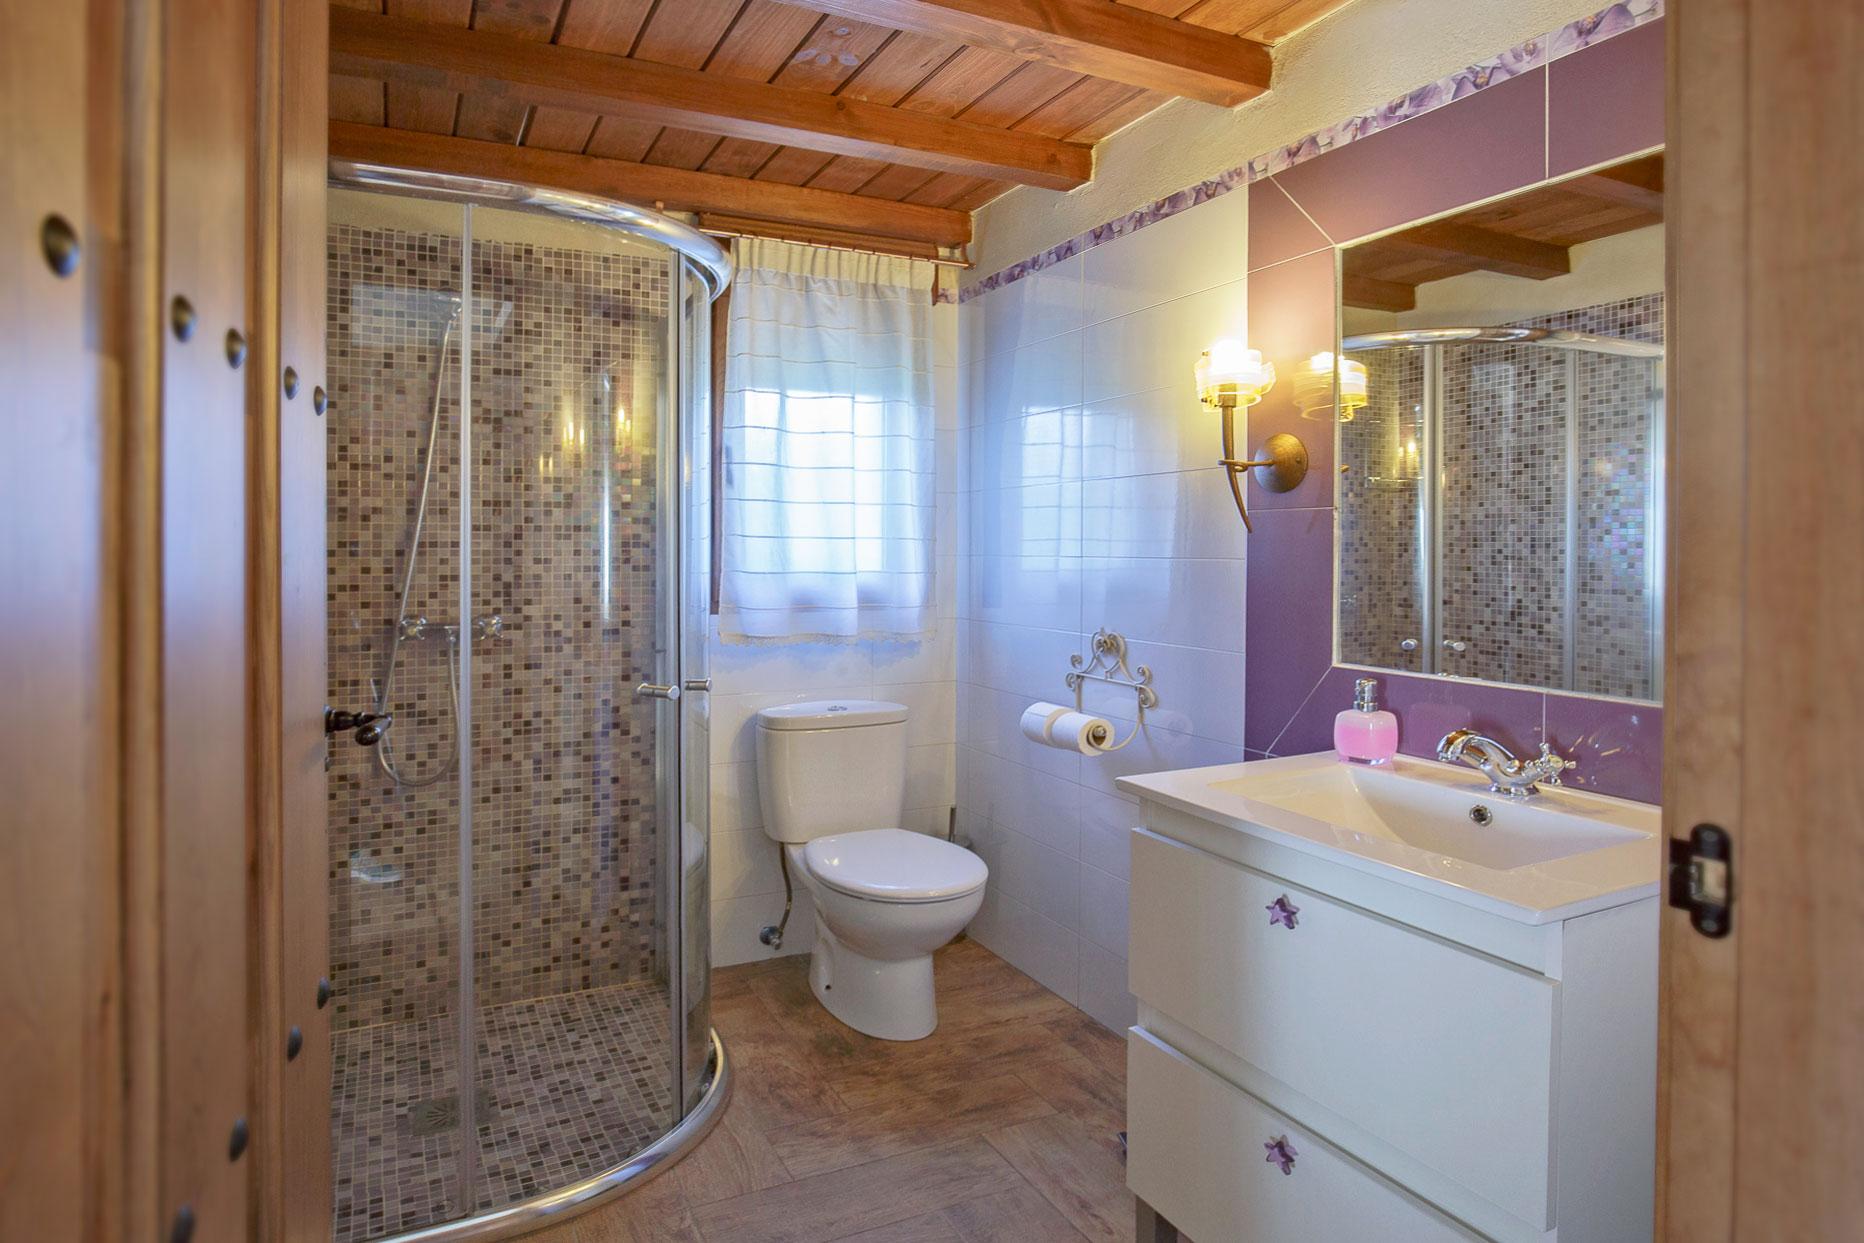 baño casa rural la picota Valle del jerte